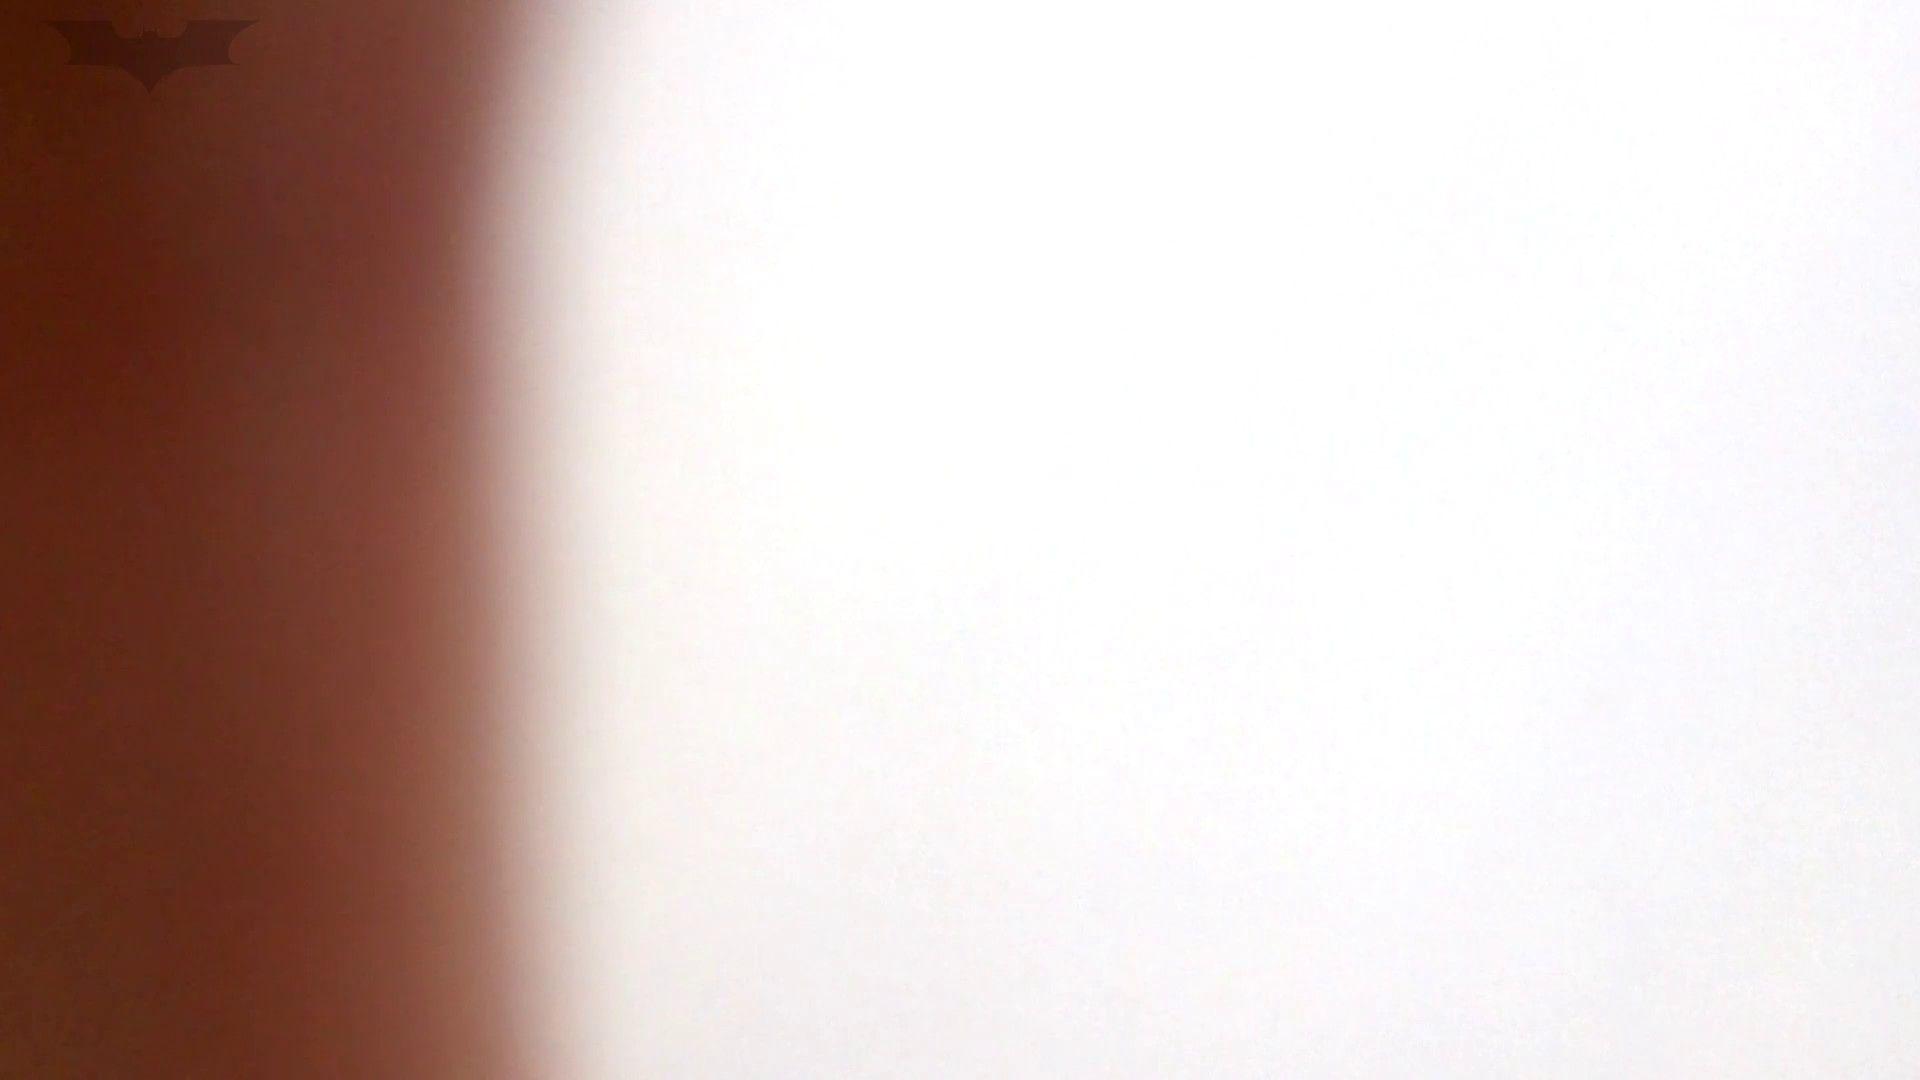 JD盗撮 美女の洗面所の秘密 Vol.06 盗撮で悶絶 ぱこり動画紹介 79画像 62